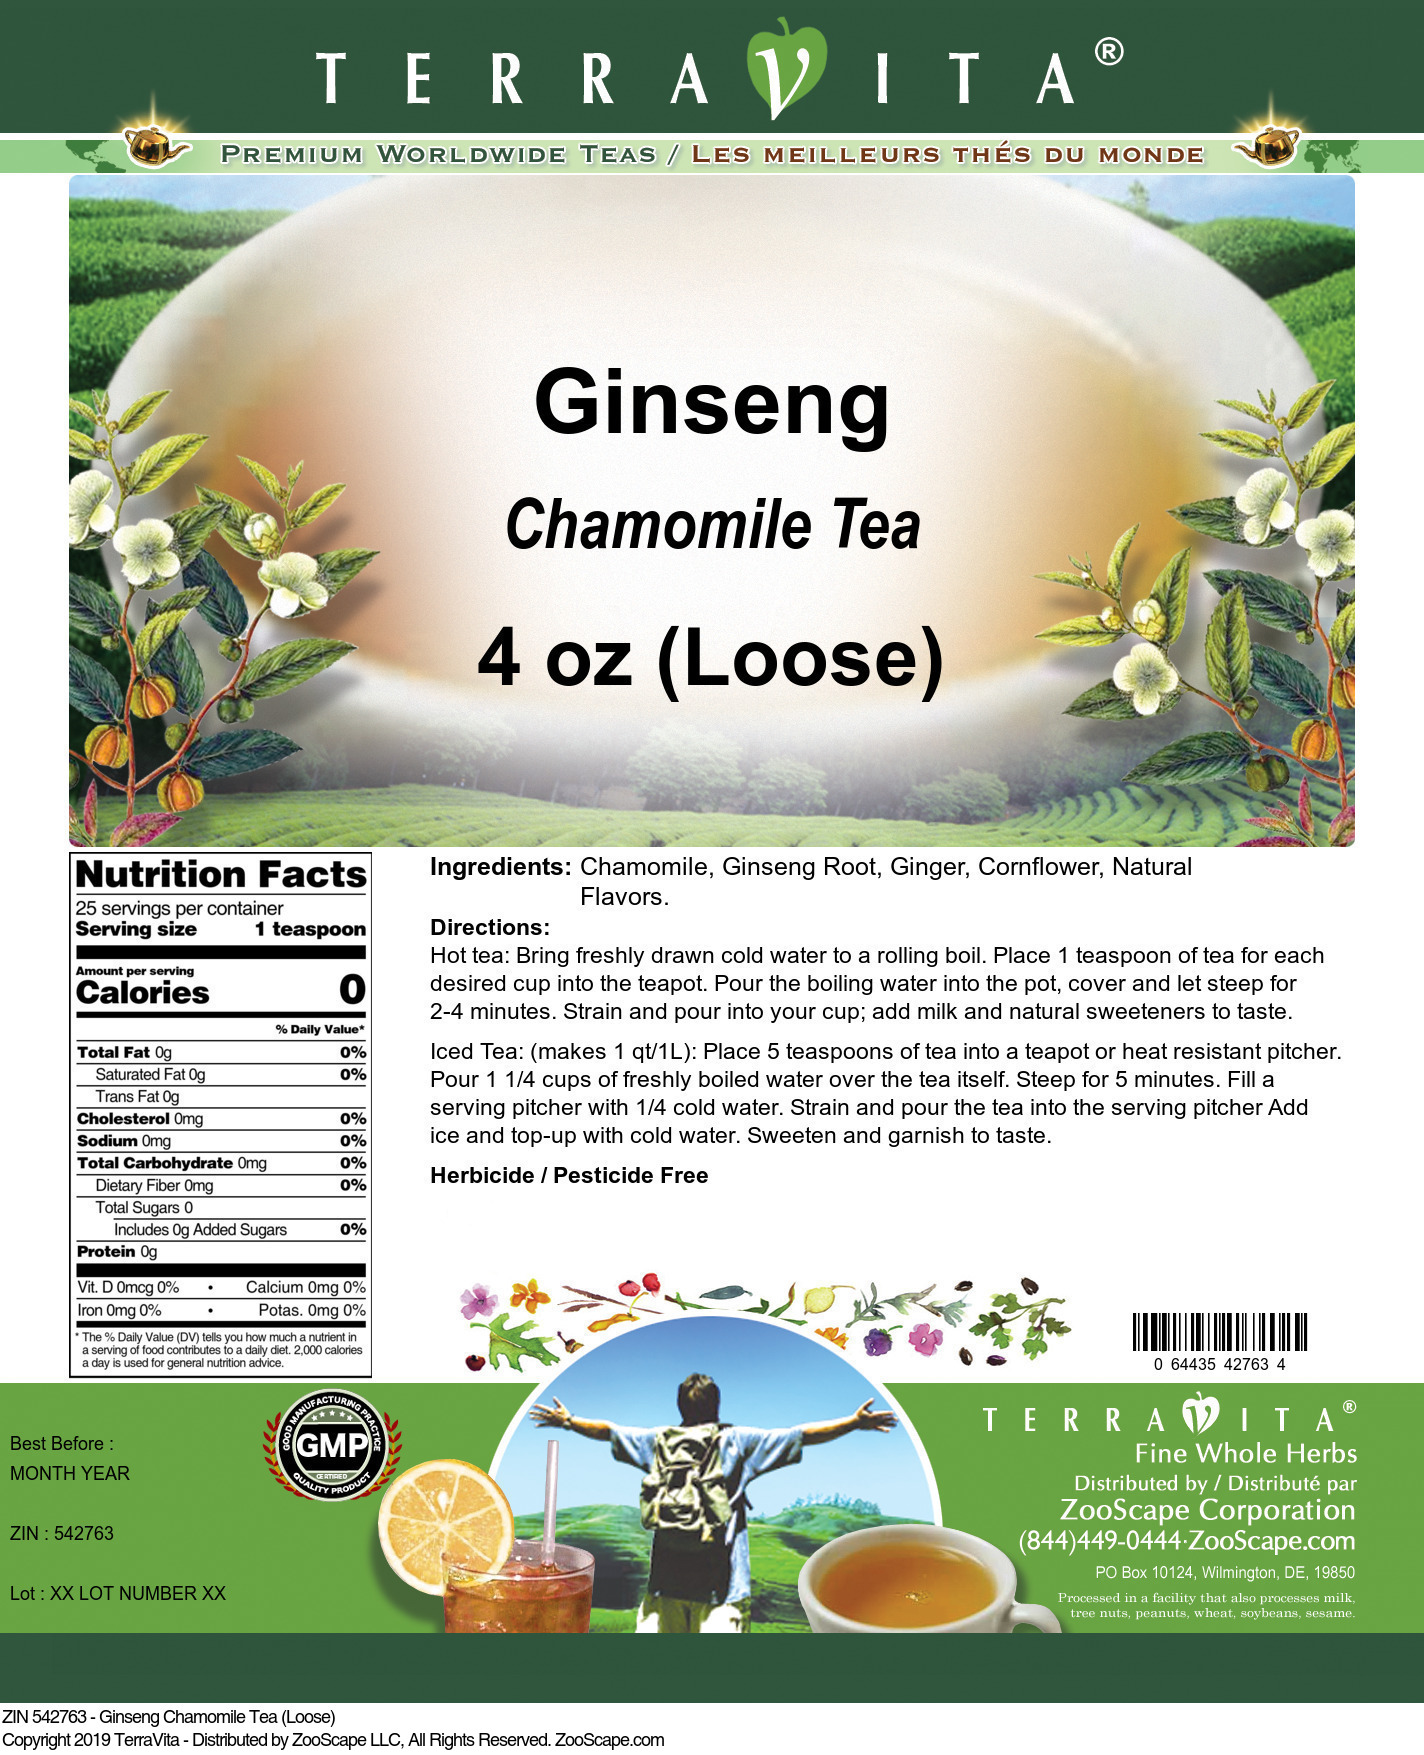 Ginseng Chamomile Tea (Loose)